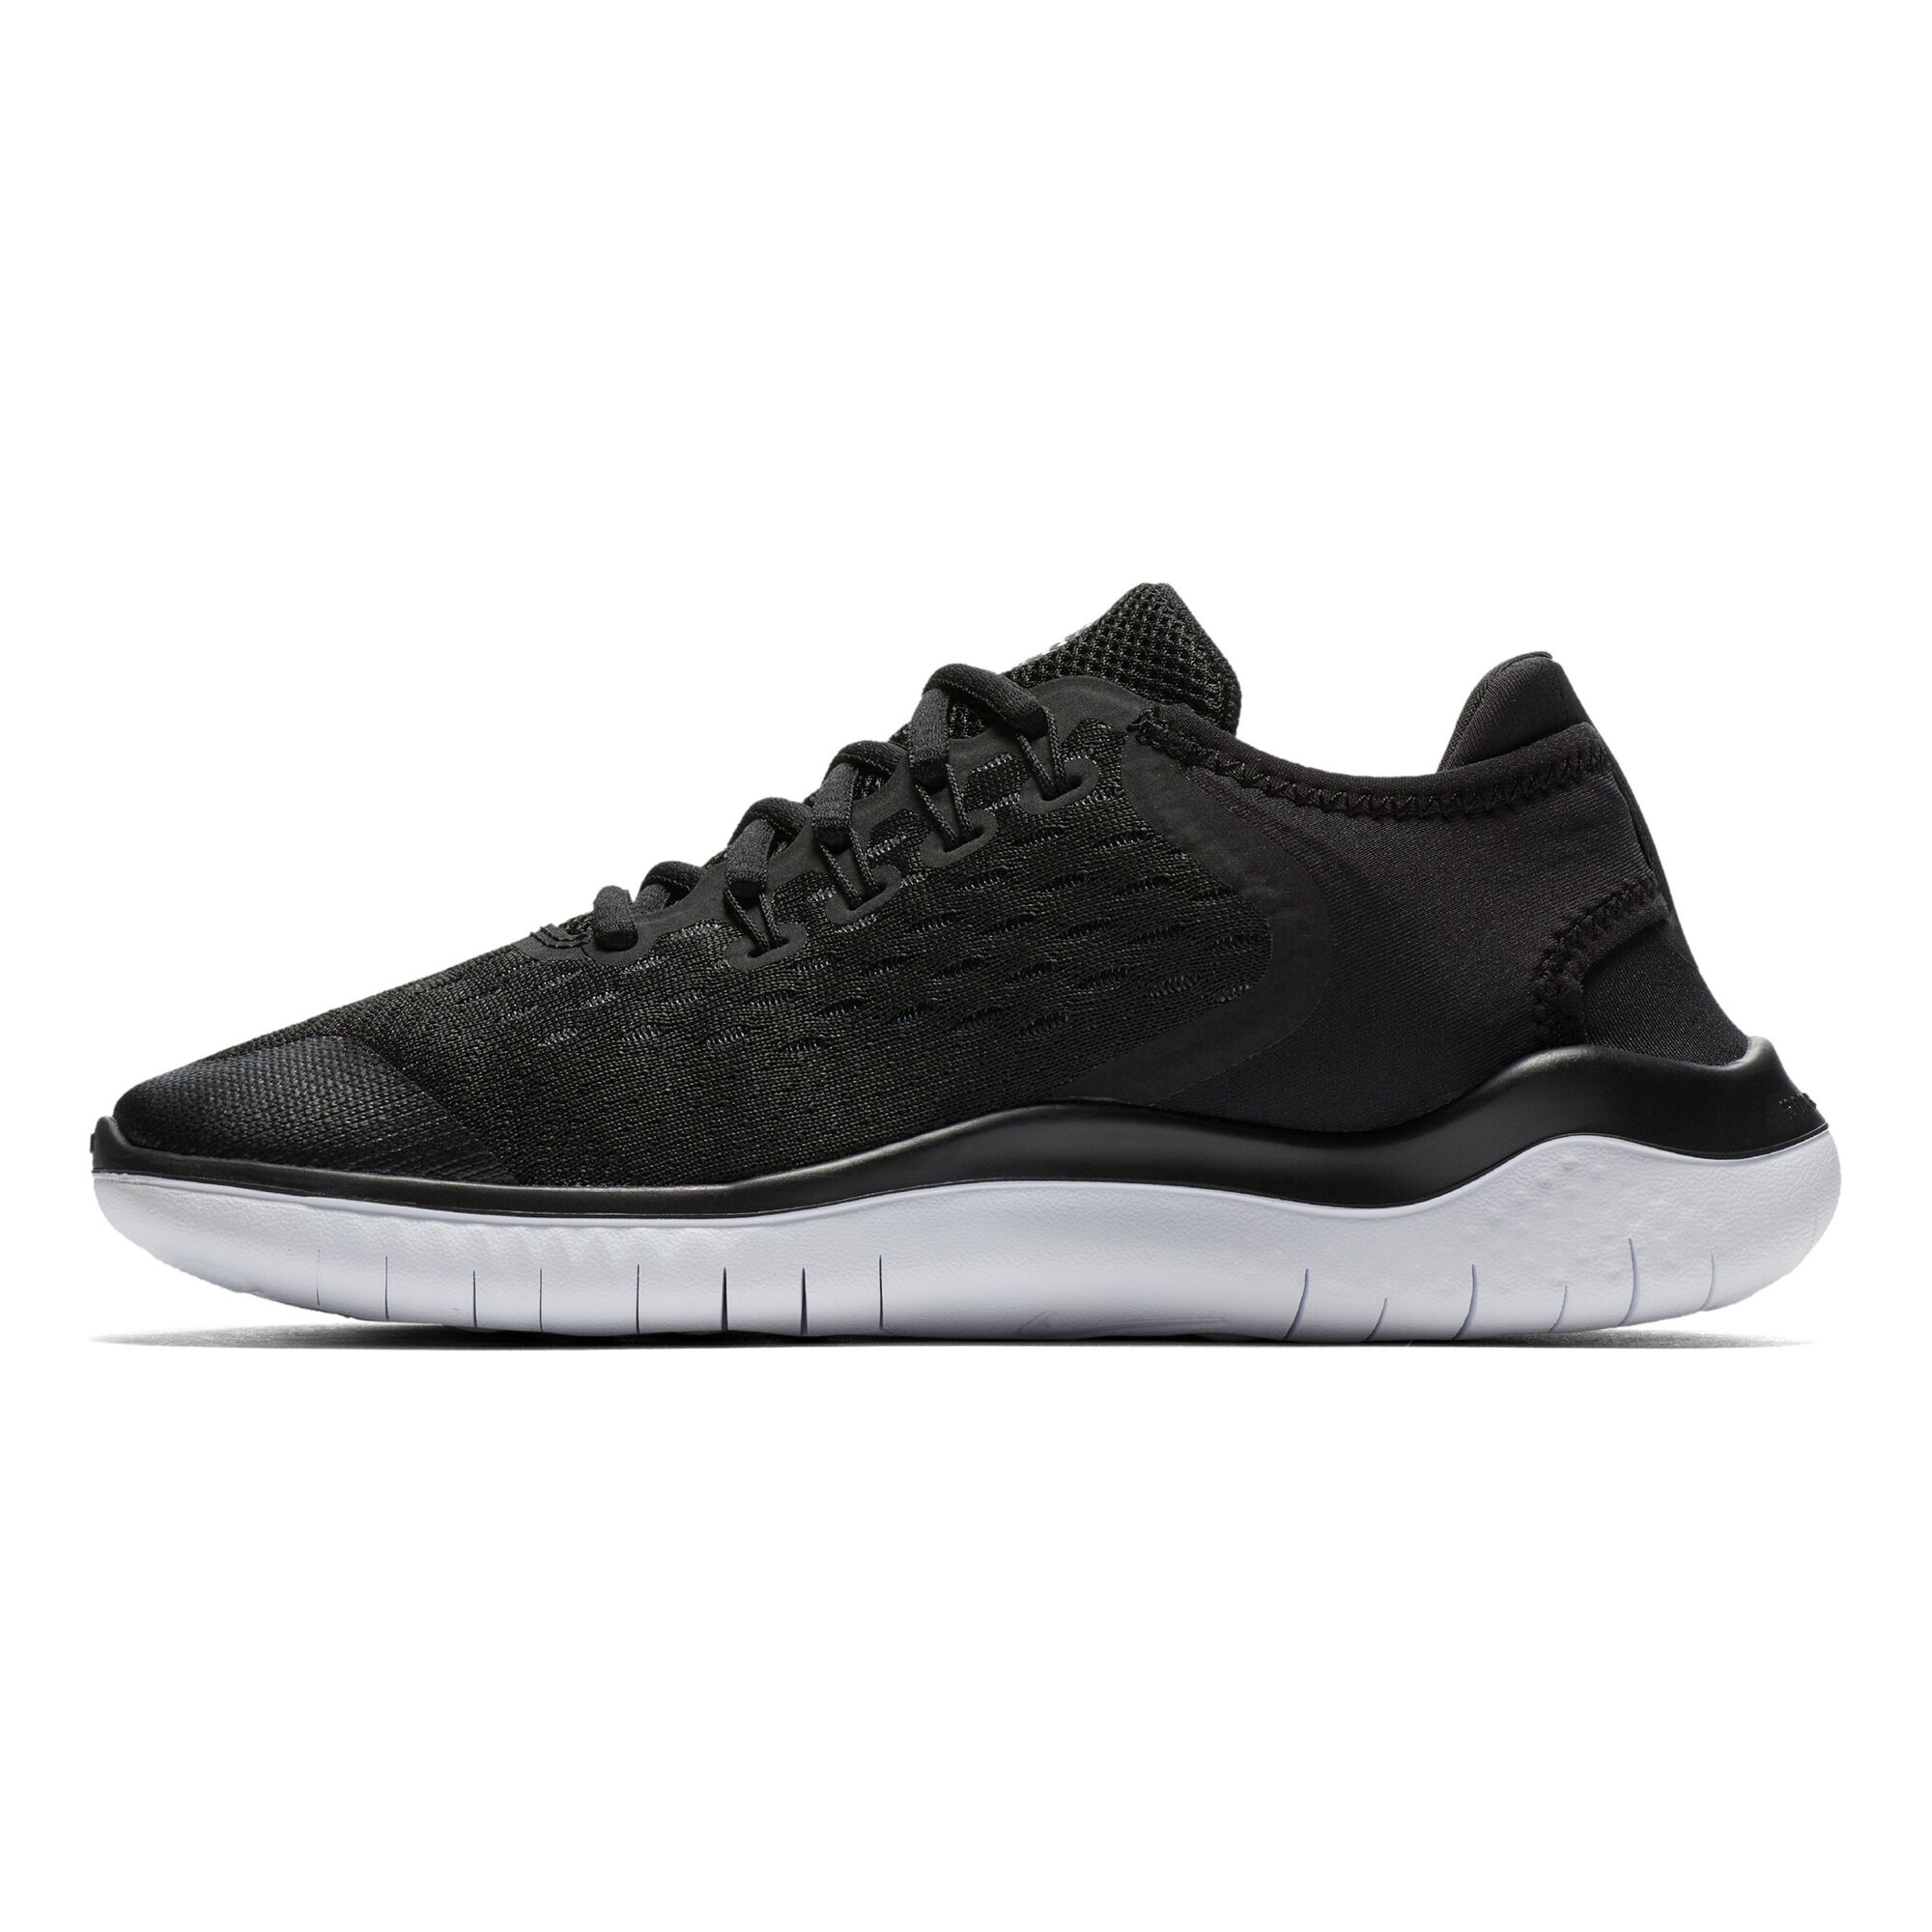 separation shoes 662b0 be408 Nike · Nike · Nike · Nike · Nike · Nike · Nike · Nike. Free Run 2018 Kids  ...